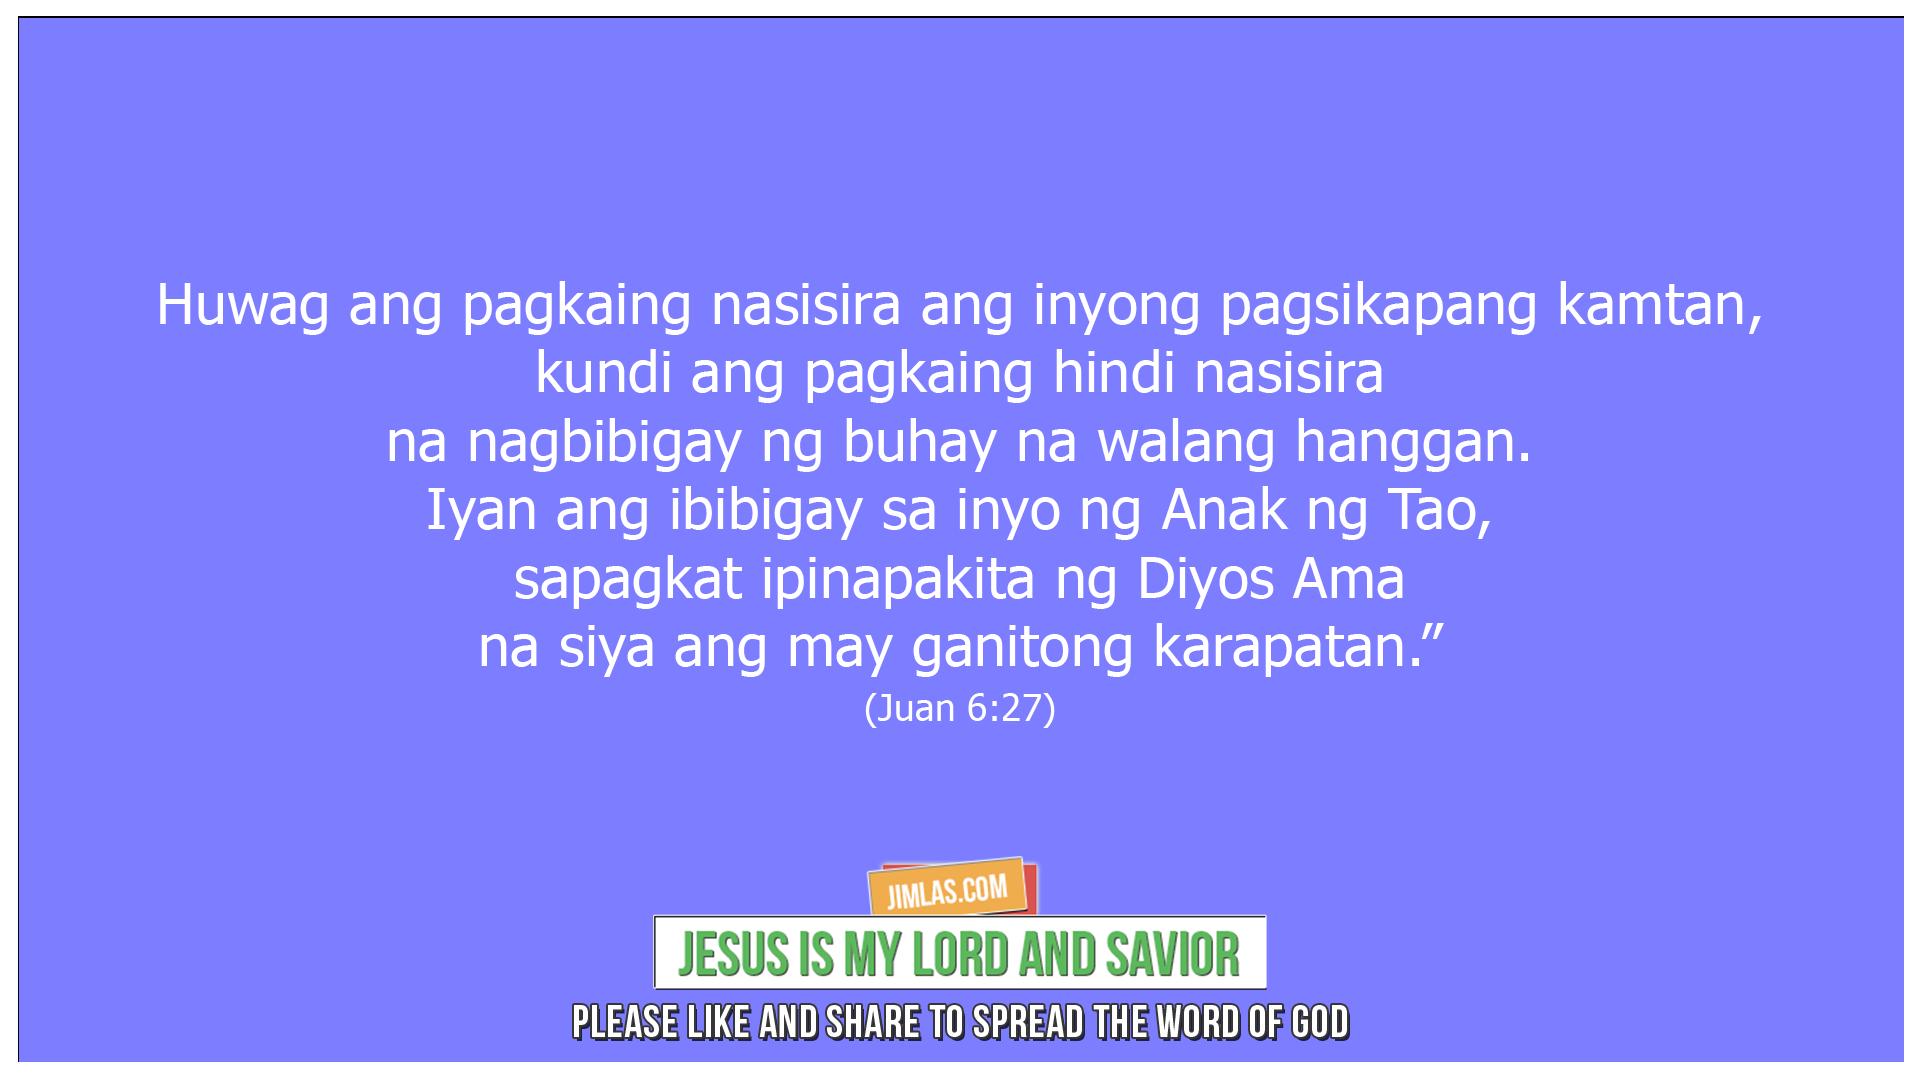 Juan 6 27, Juan 6:27